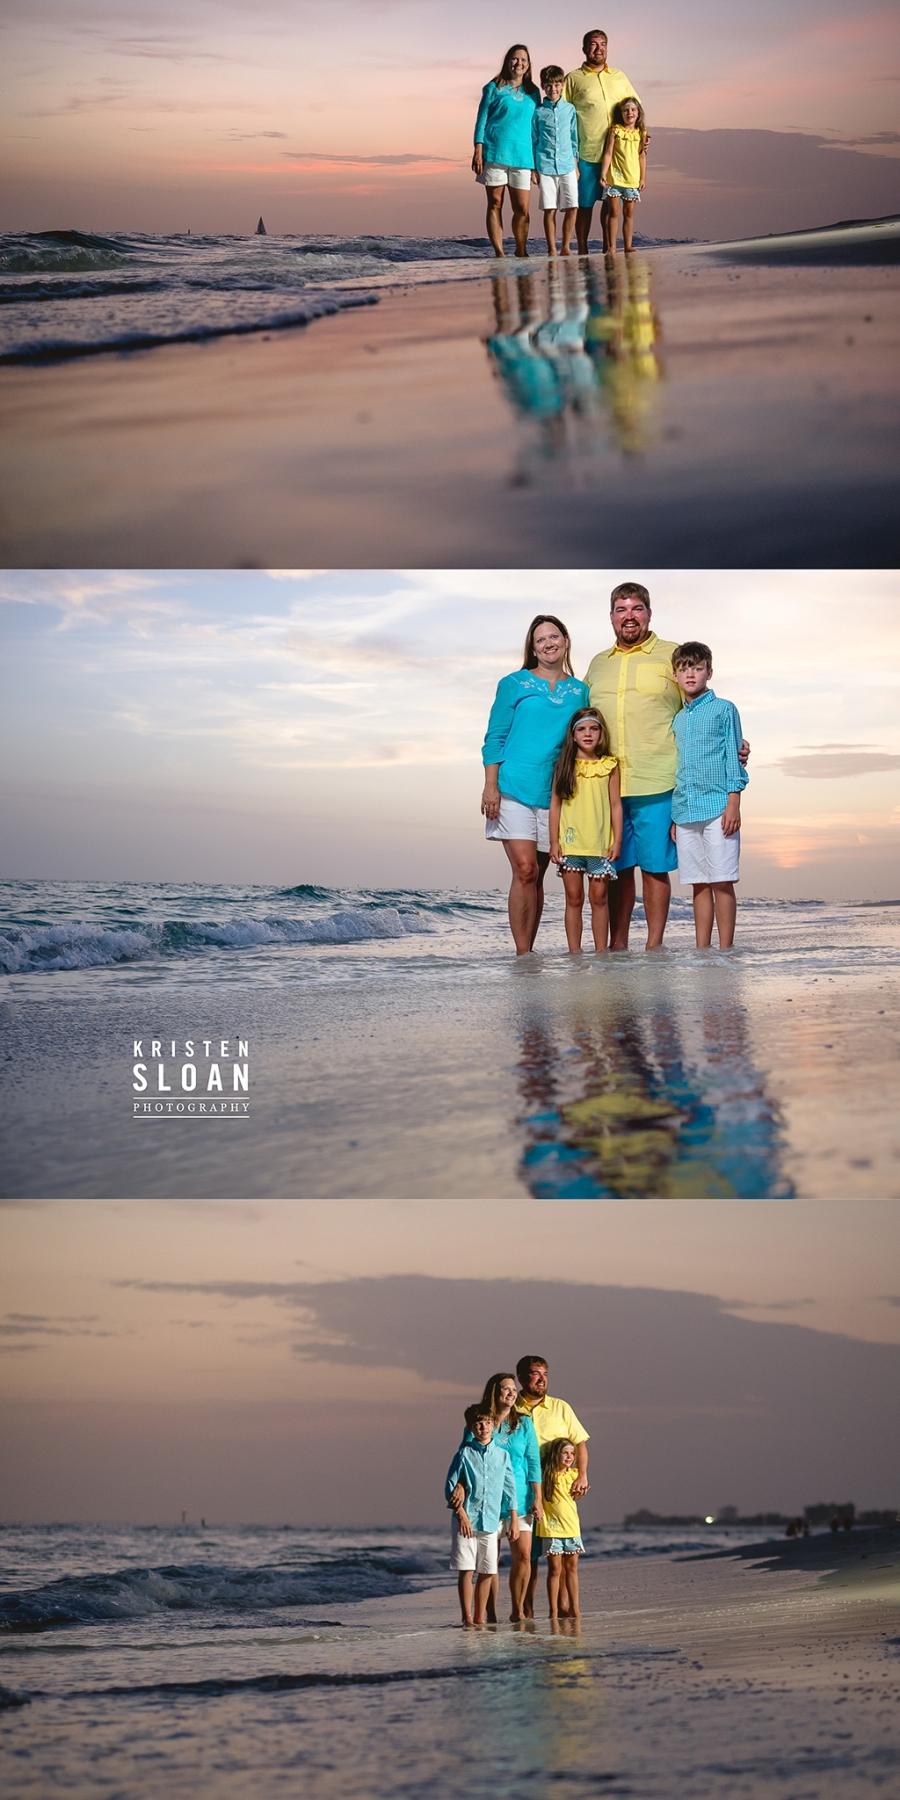 St Pete Beach Treasure Island Photographer Kristen Sloan | Sunset in Treasure Island